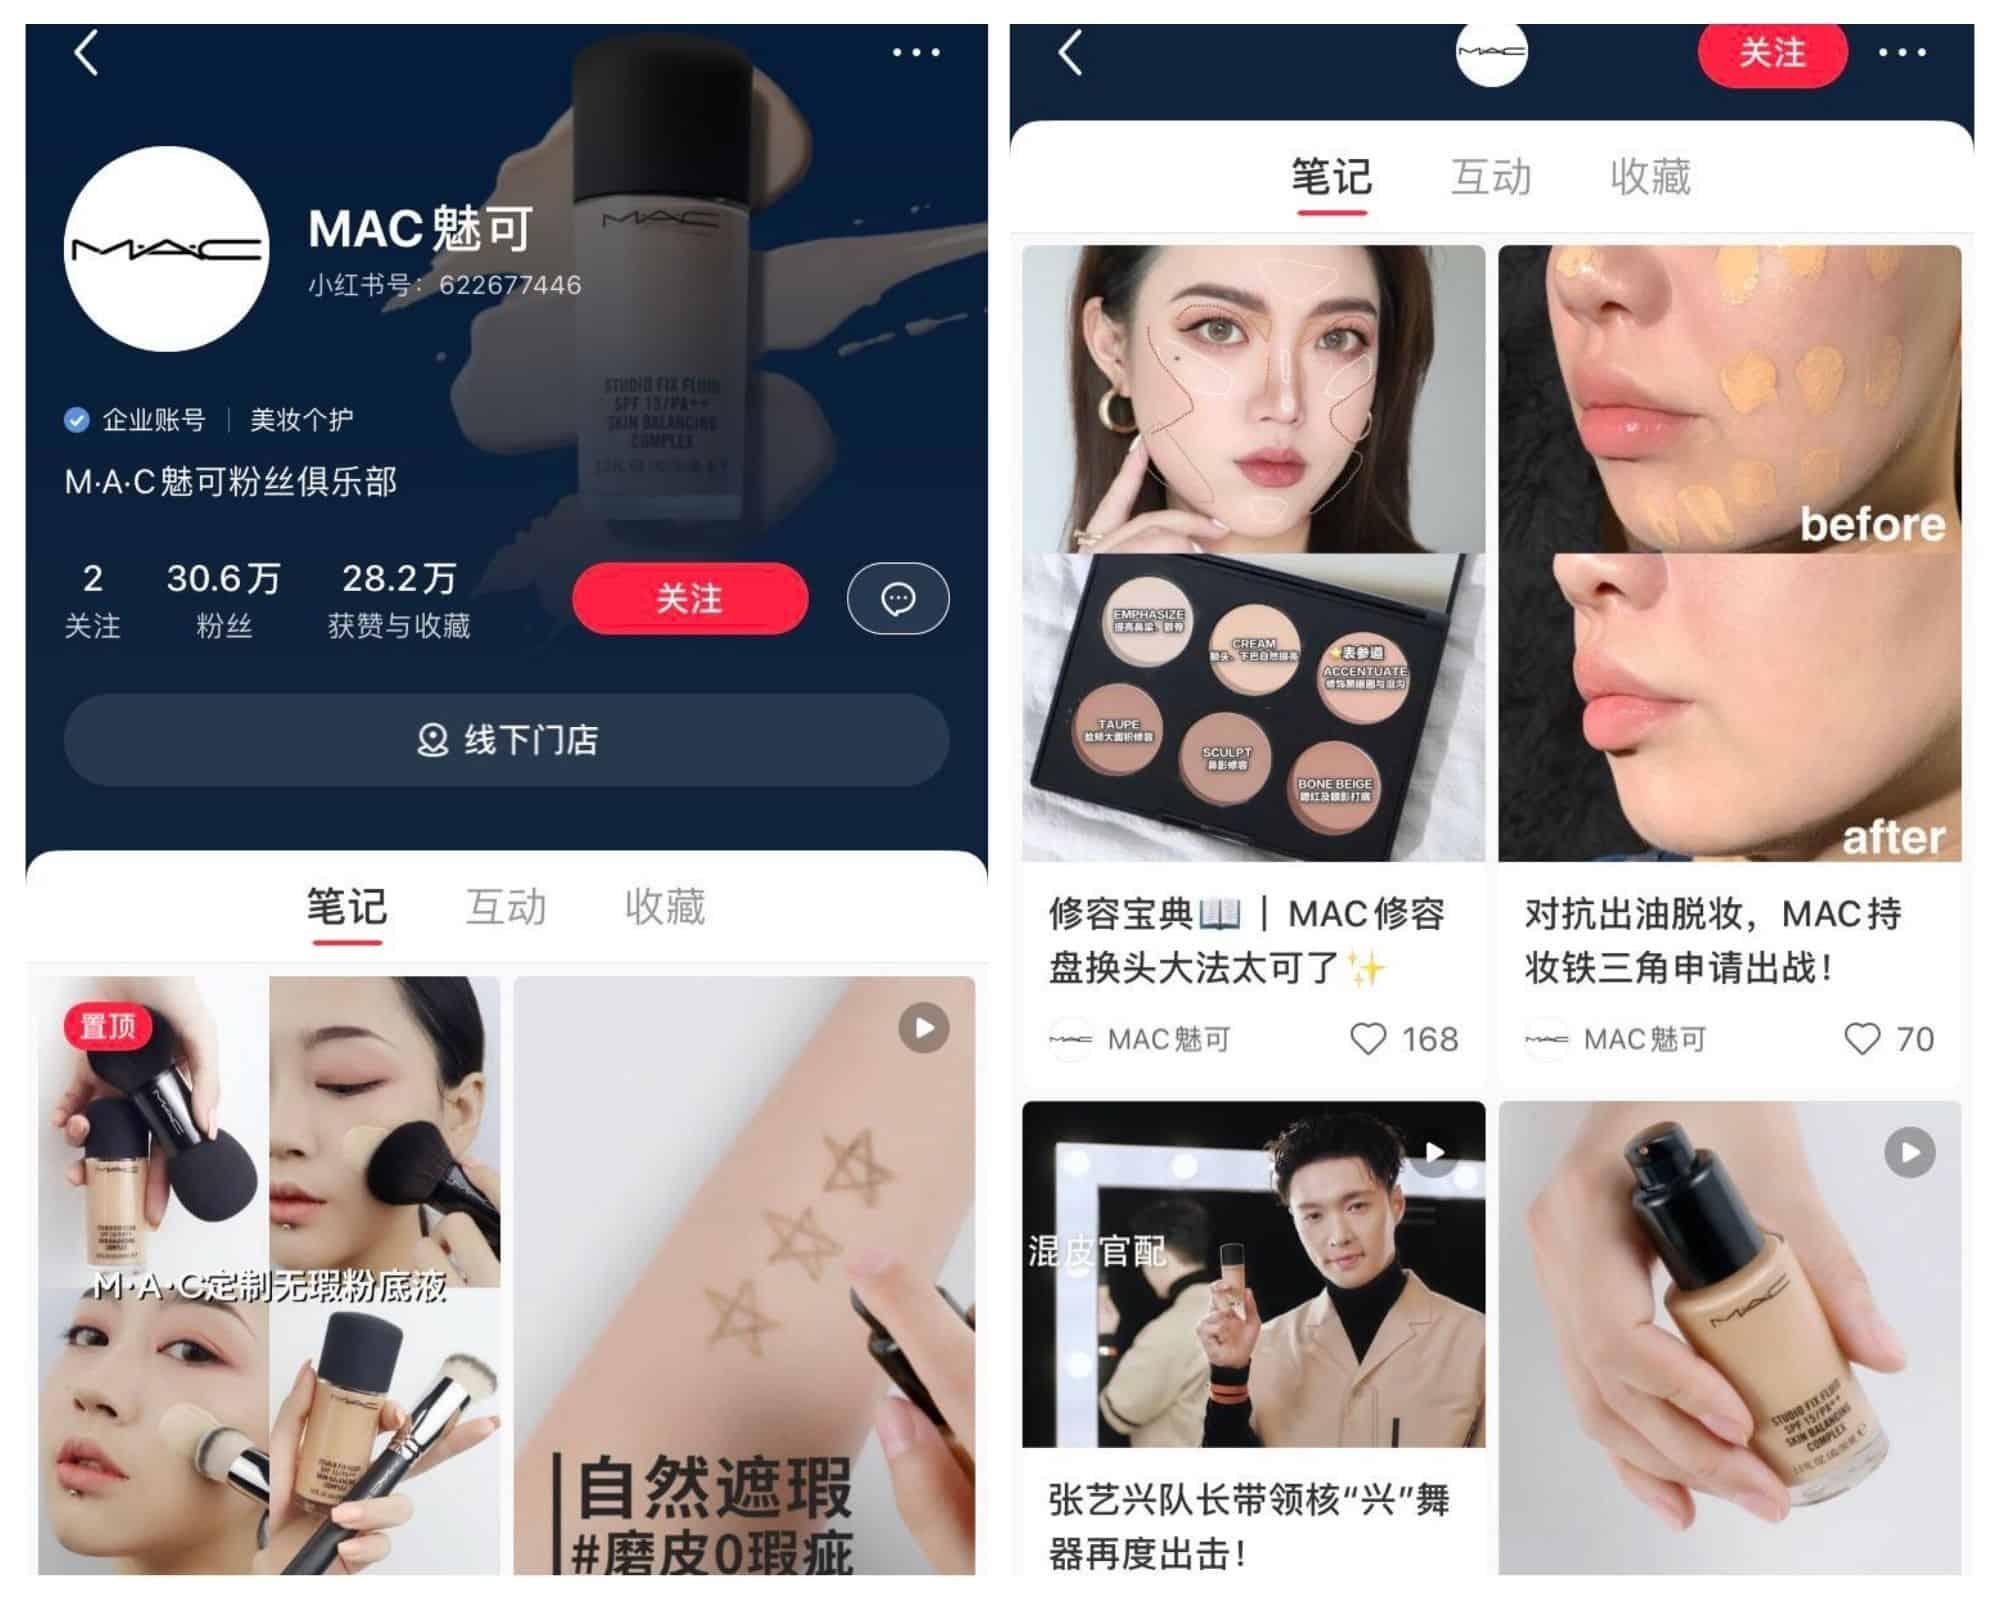 China Social Media - Xiaohongshu officila brand account